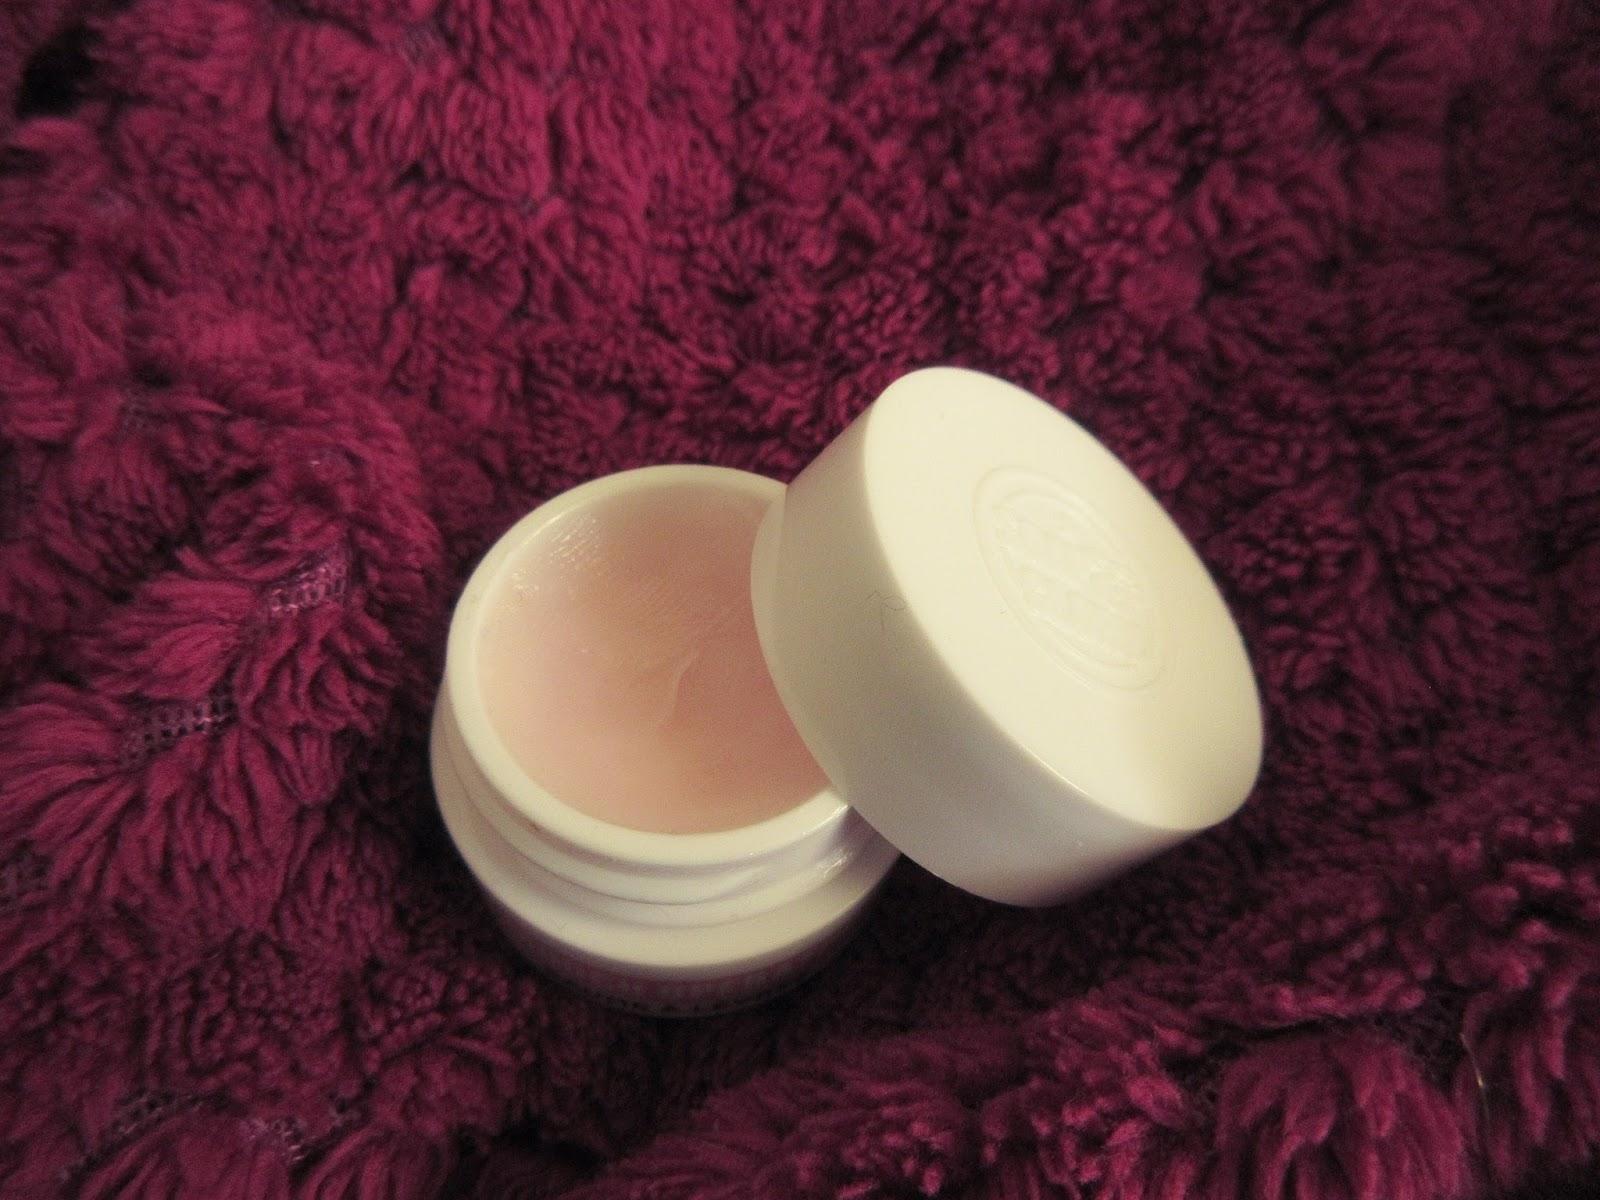 Soap&Glory Smooch Operator Lip Butter Balm Review